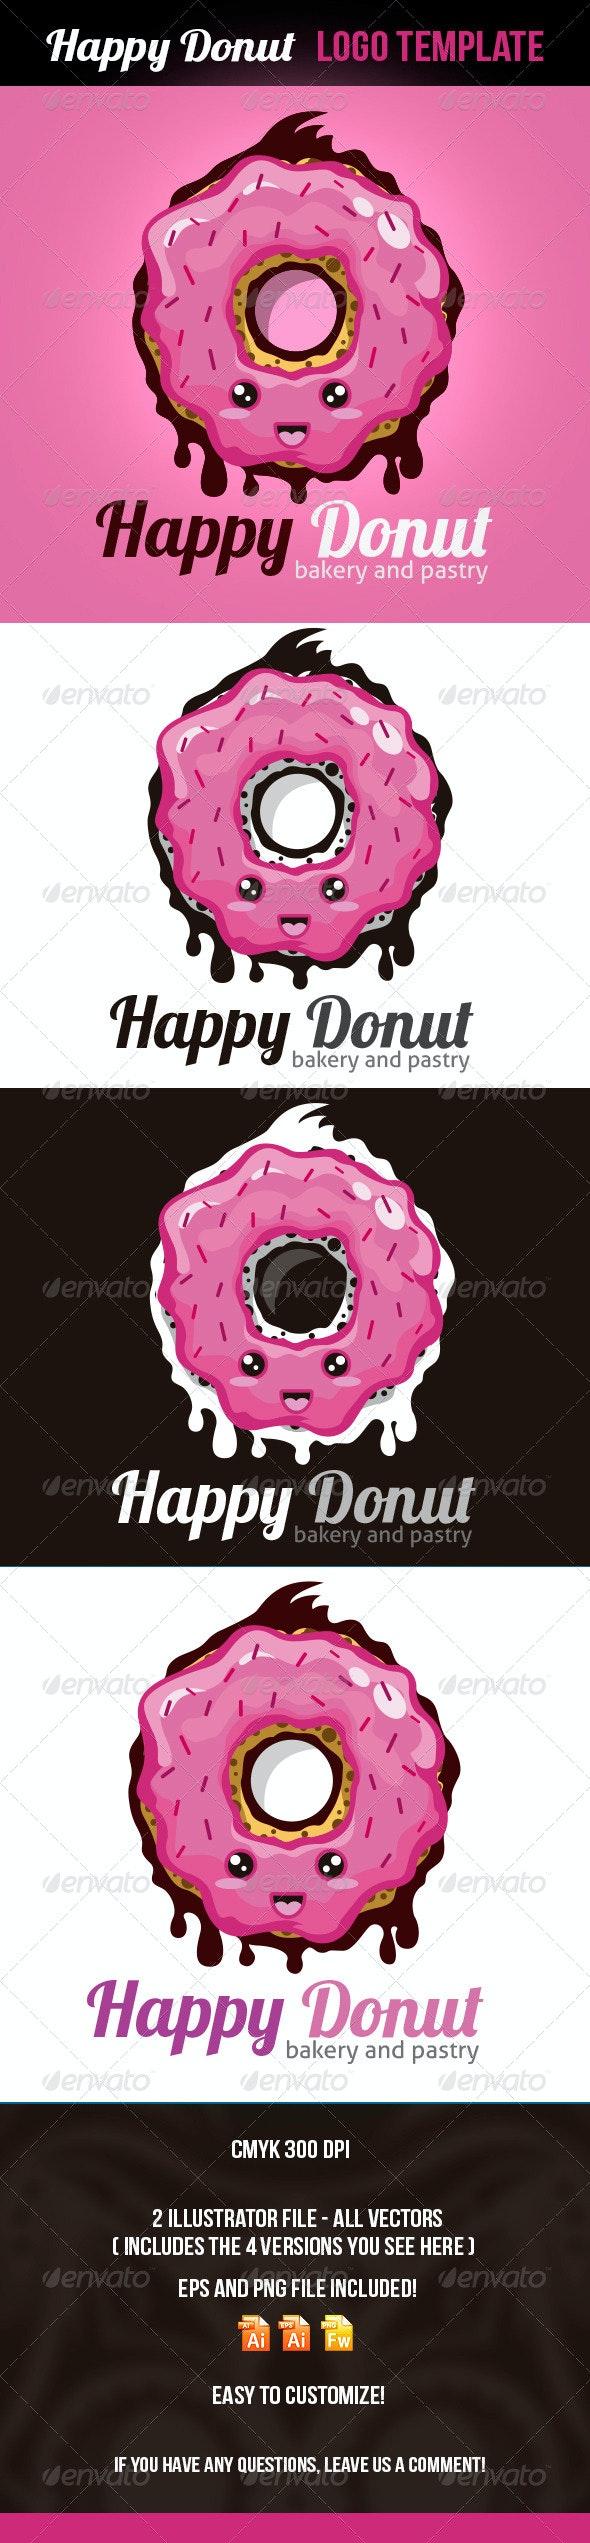 Happy Donut Logo Template - Food Logo Templates